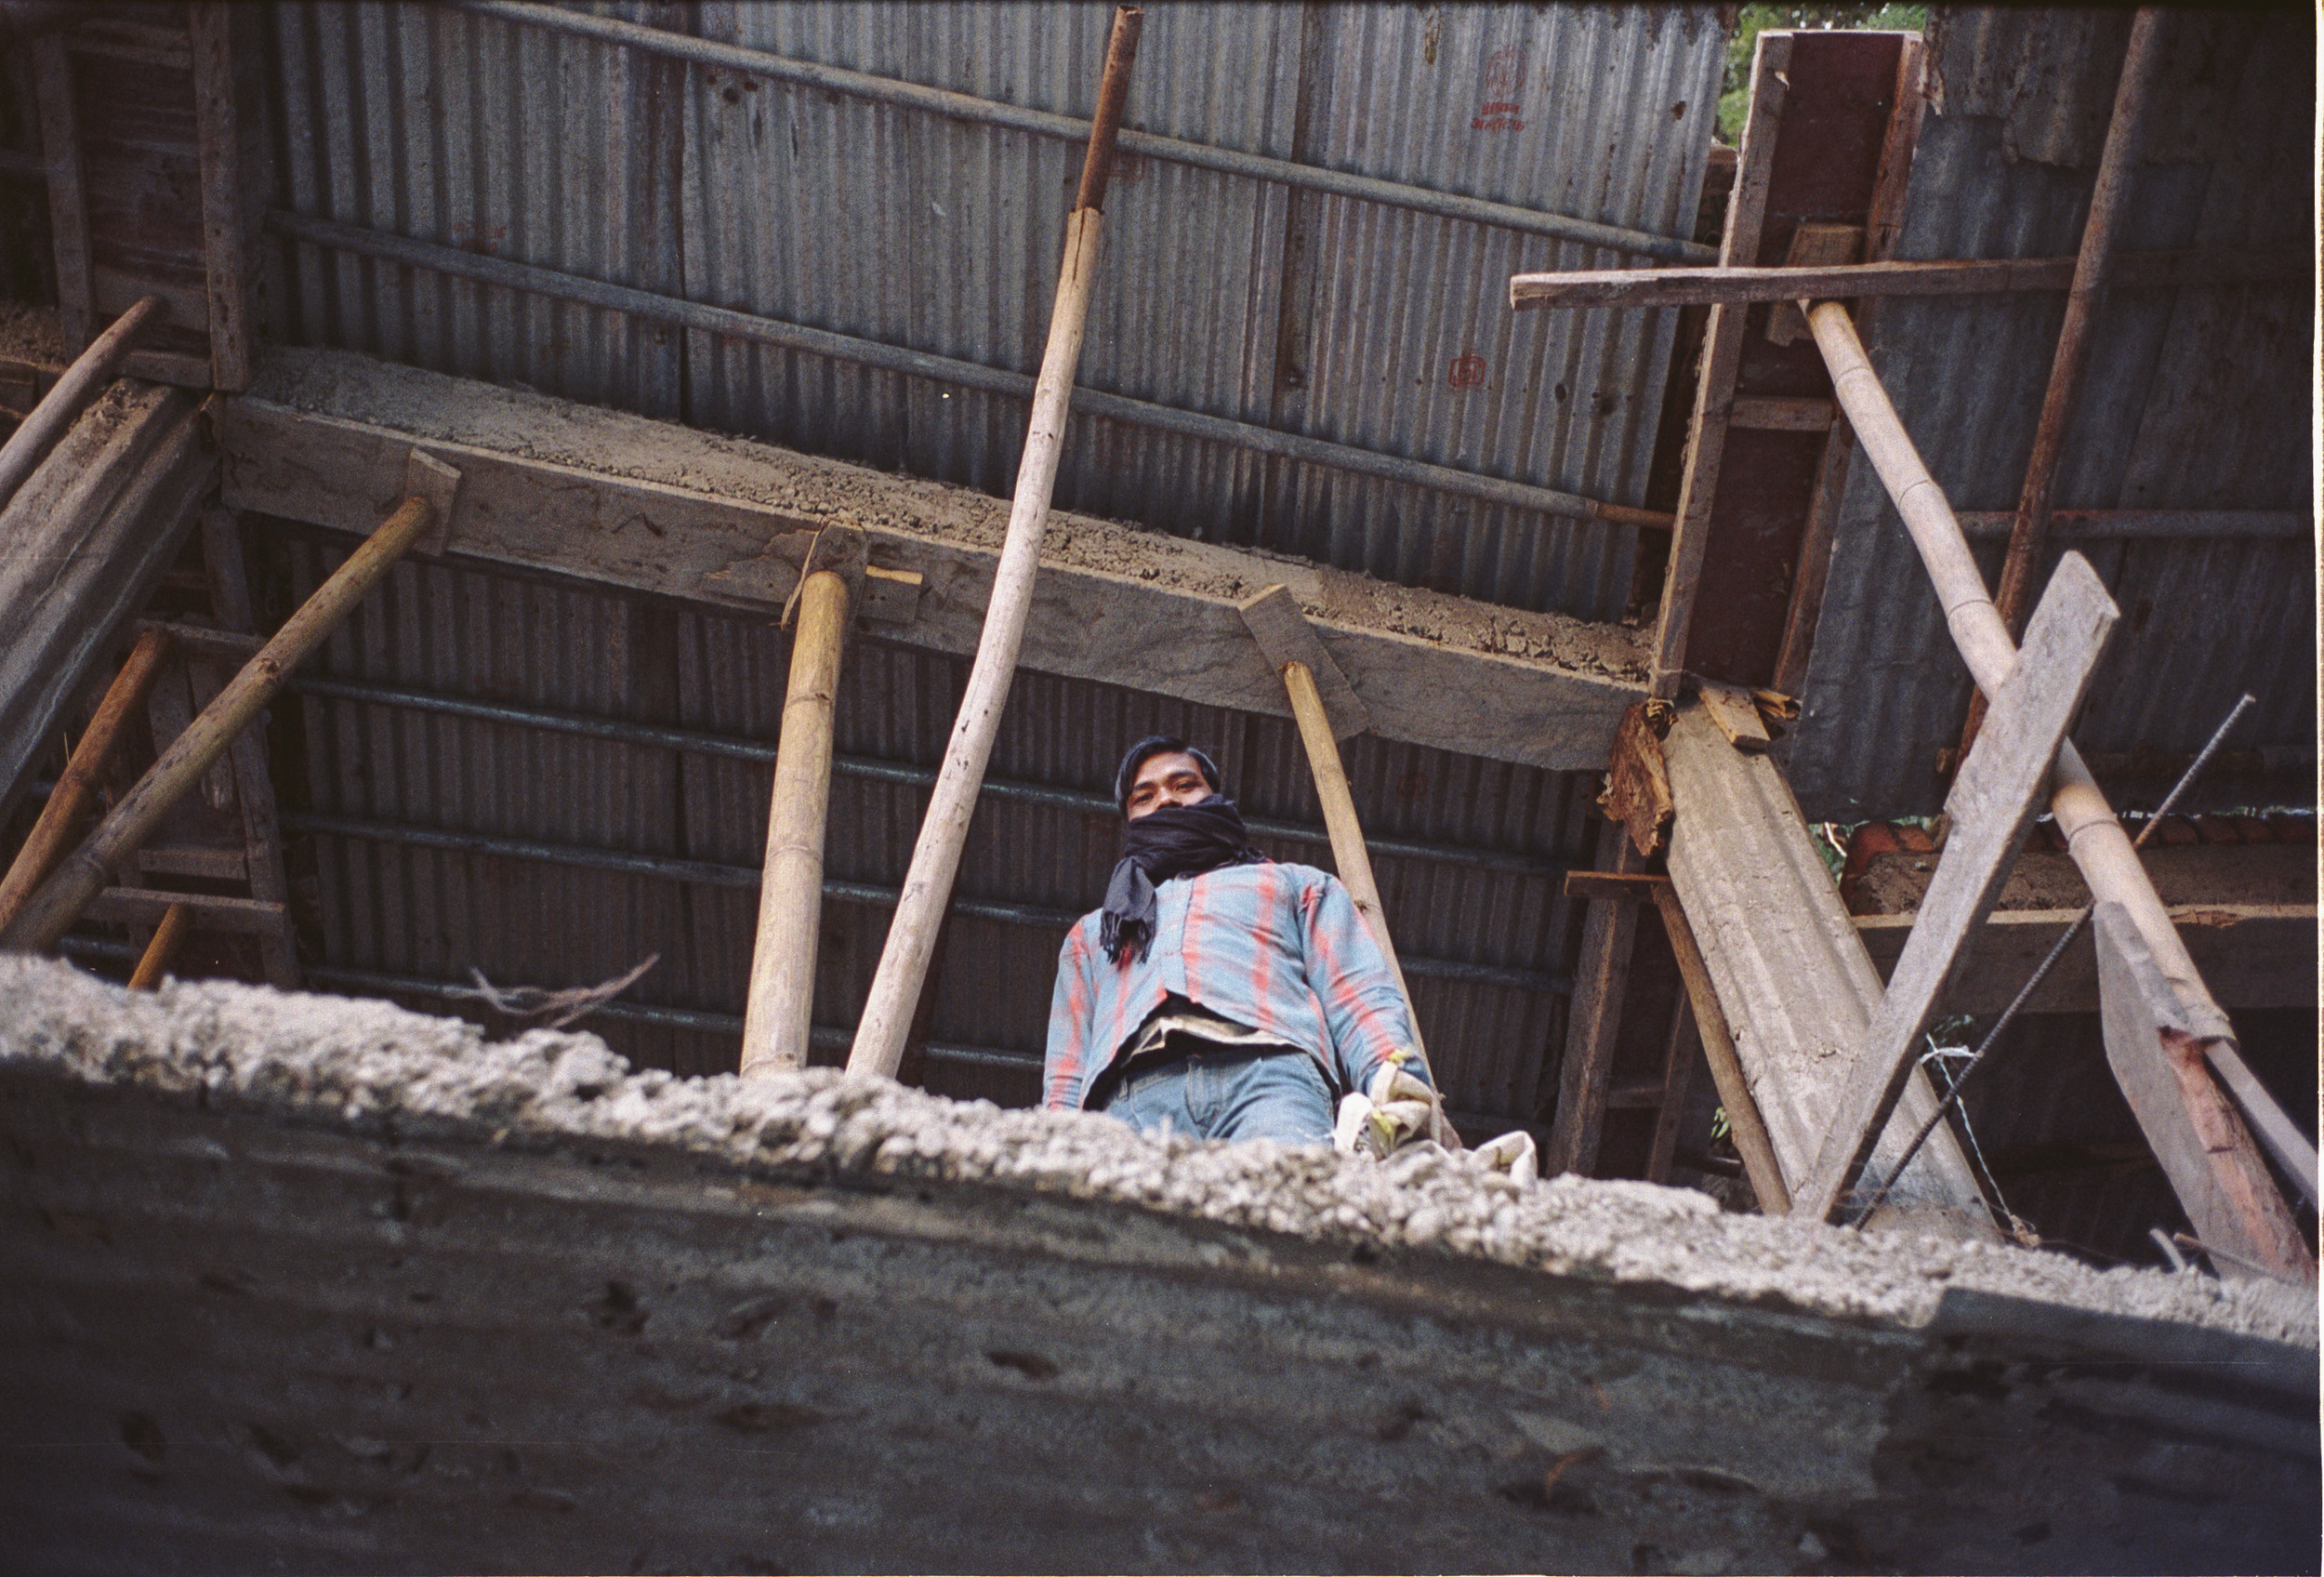 71-F7_Construction Worker, Kempti Falls, Moussoori, India 2016-39.jpg